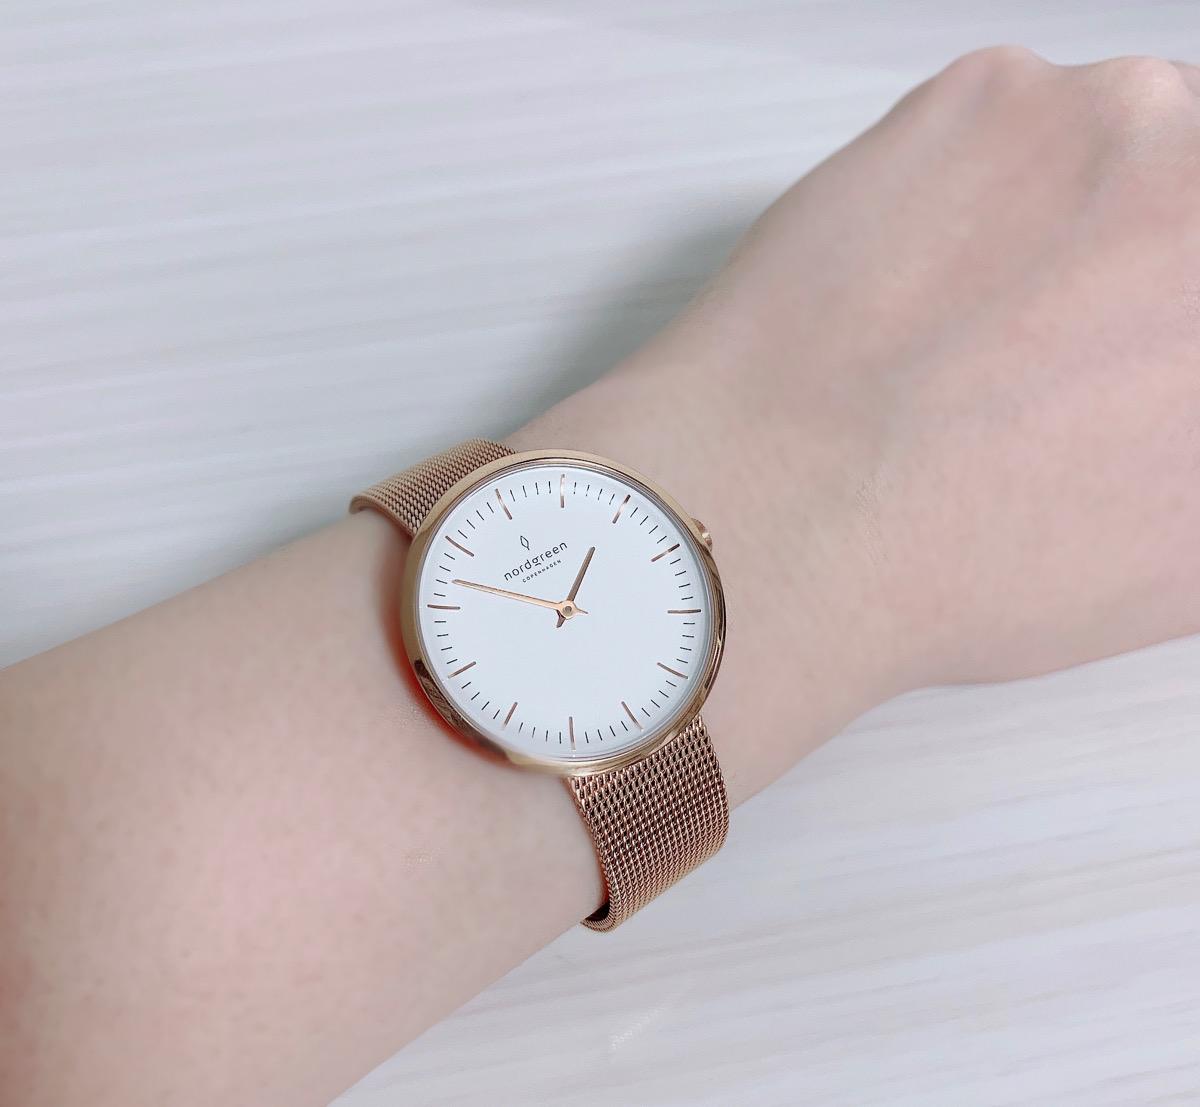 Nordgreen(ノードグリーン)の時計着用写真(レビュー)